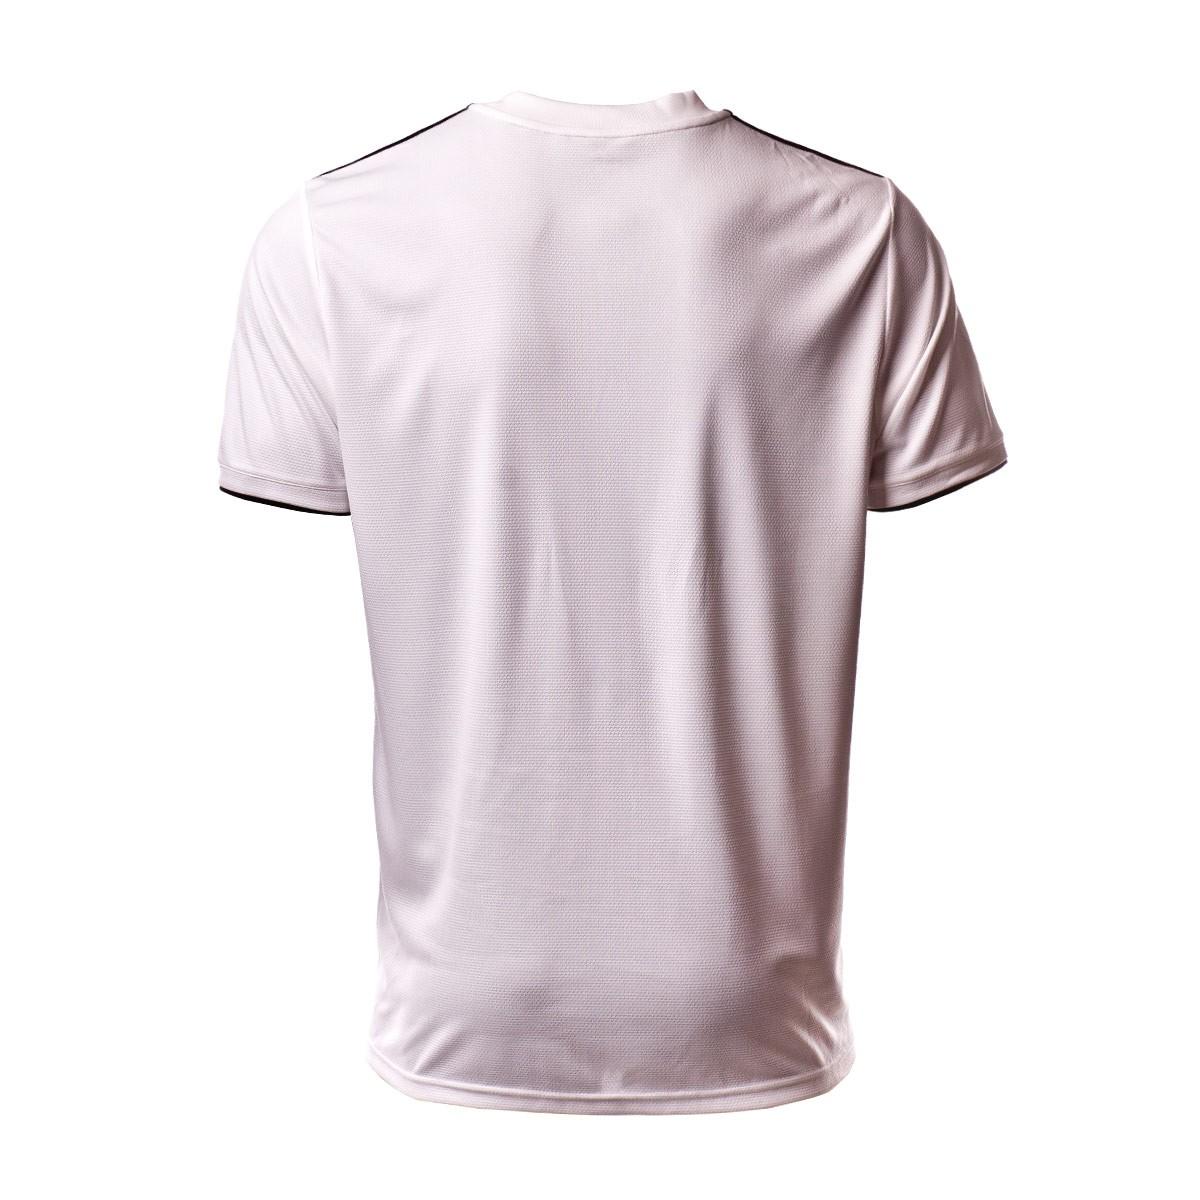 premium selection fd79c c8ff3 Camiseta Real Madrid Primera Equipación LFP 2018-2019 White-black